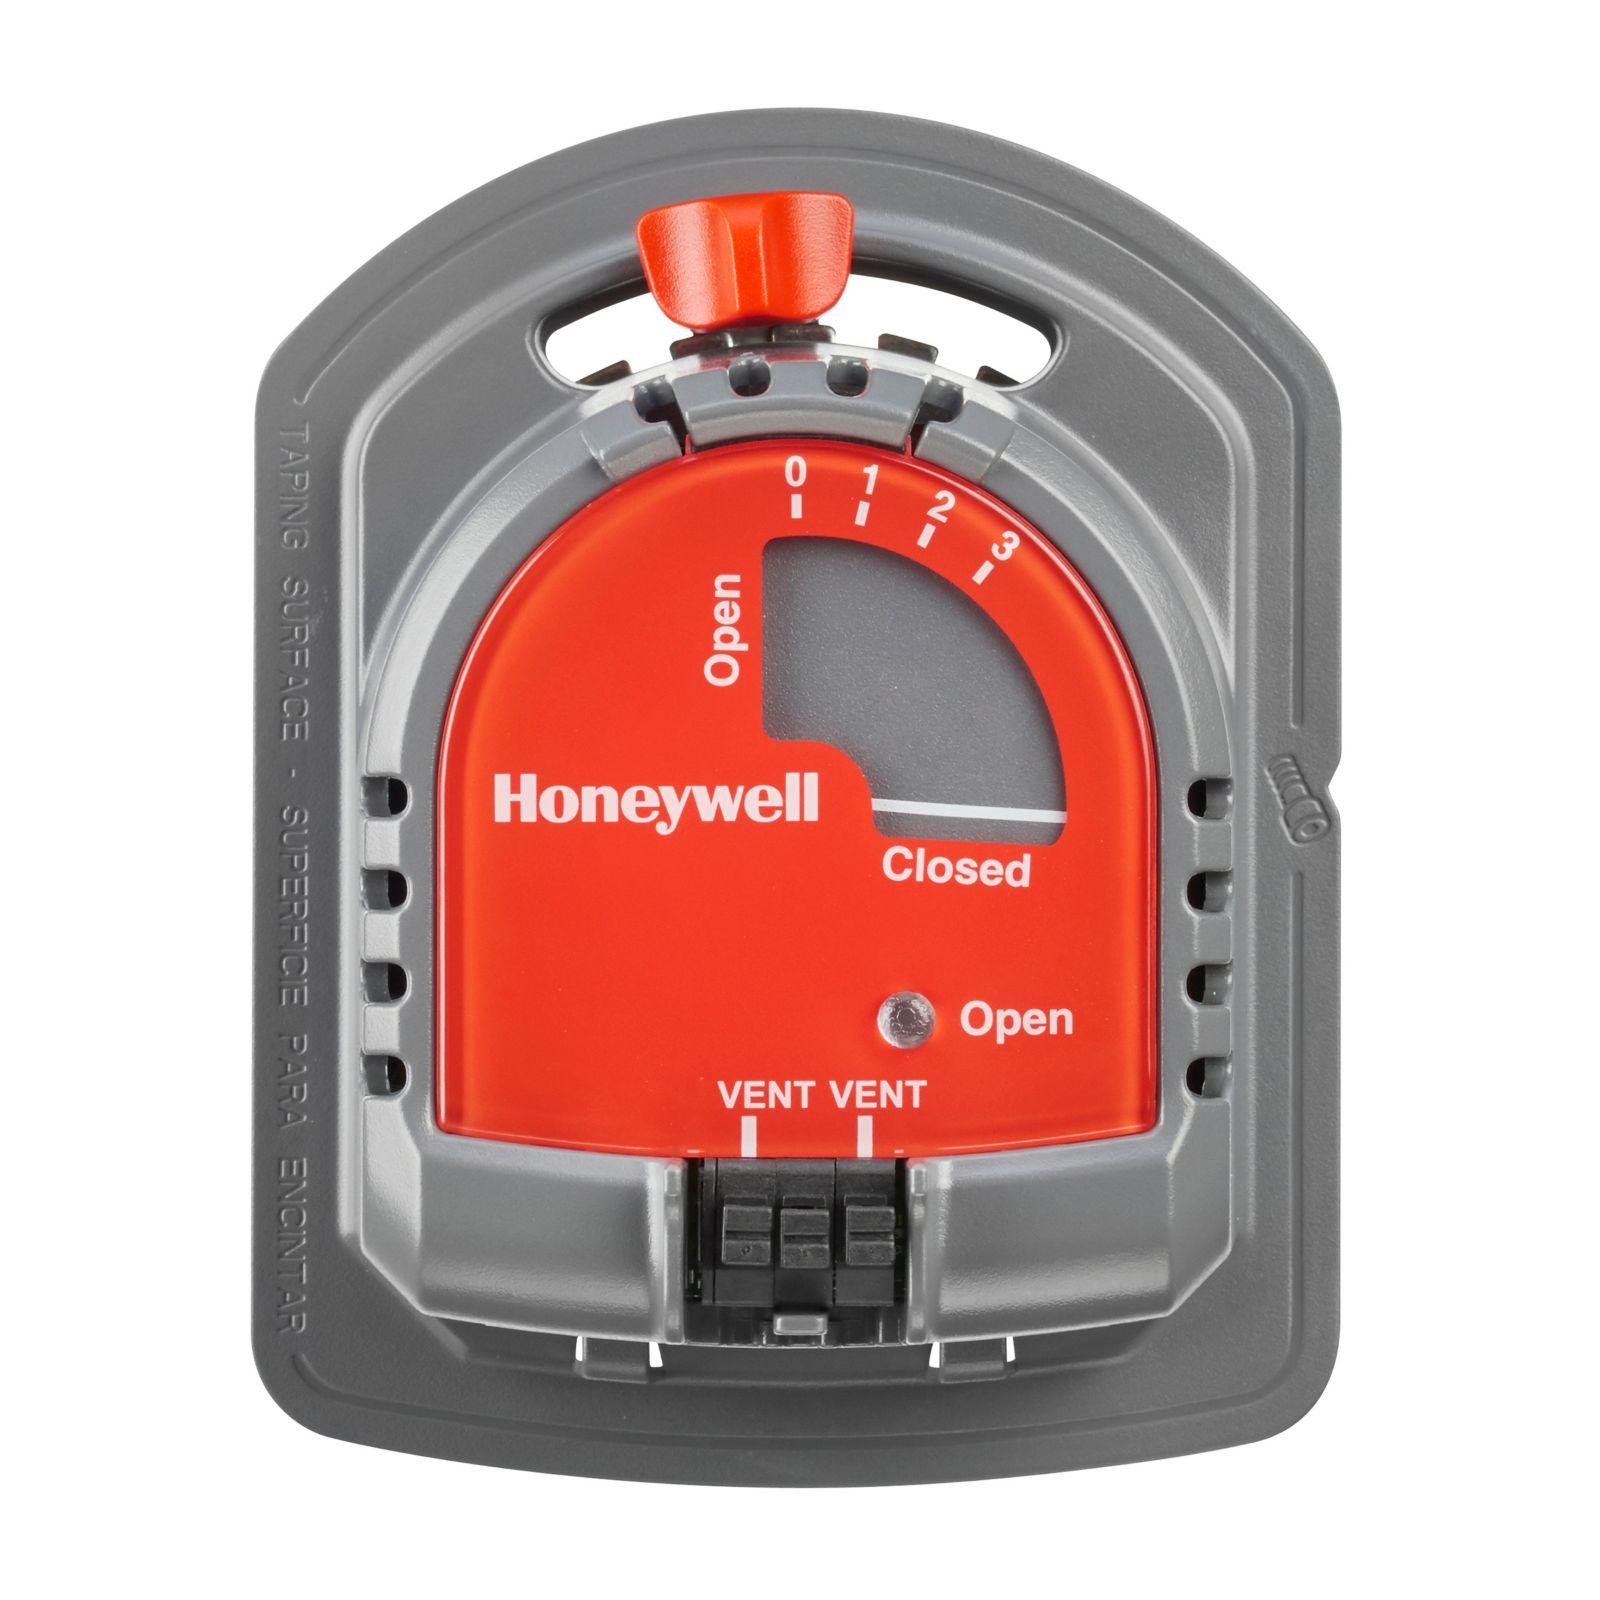 Honeywell M847D-VENT - TrueZONE Fresh Air Ventilation Damper Actuator  (Normally Closed)